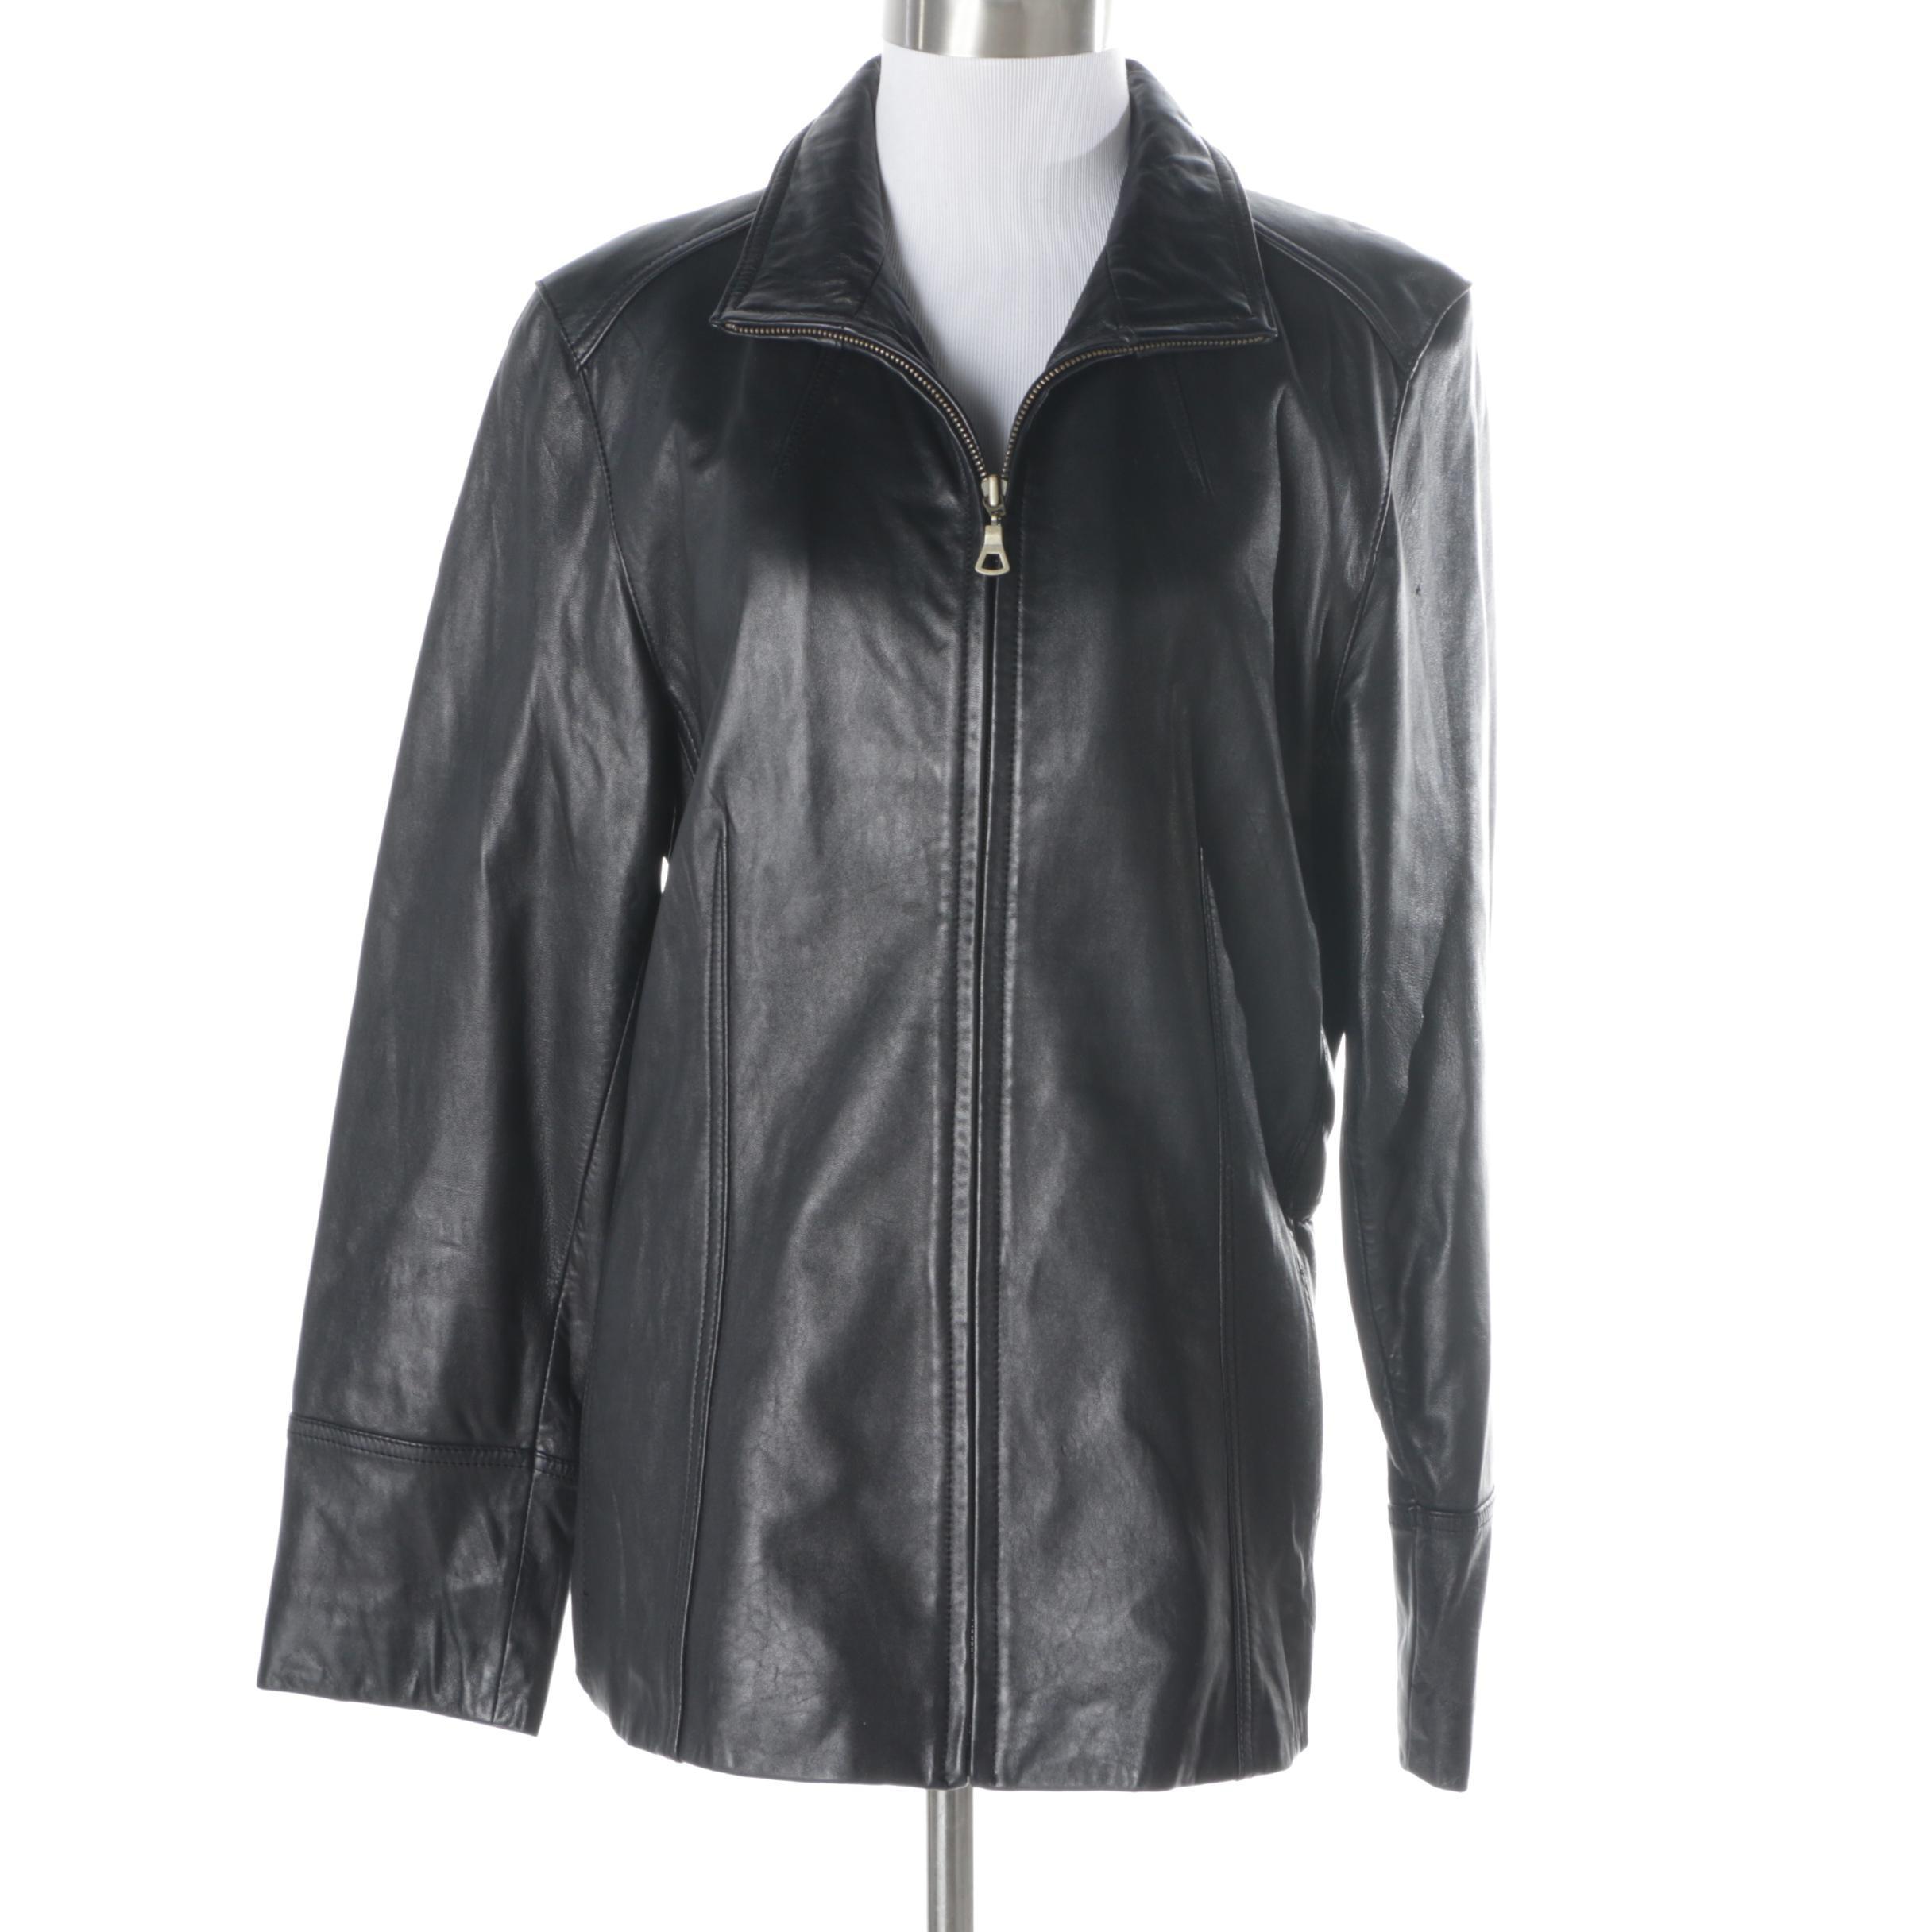 Women's Nine West Black Leather Jacket